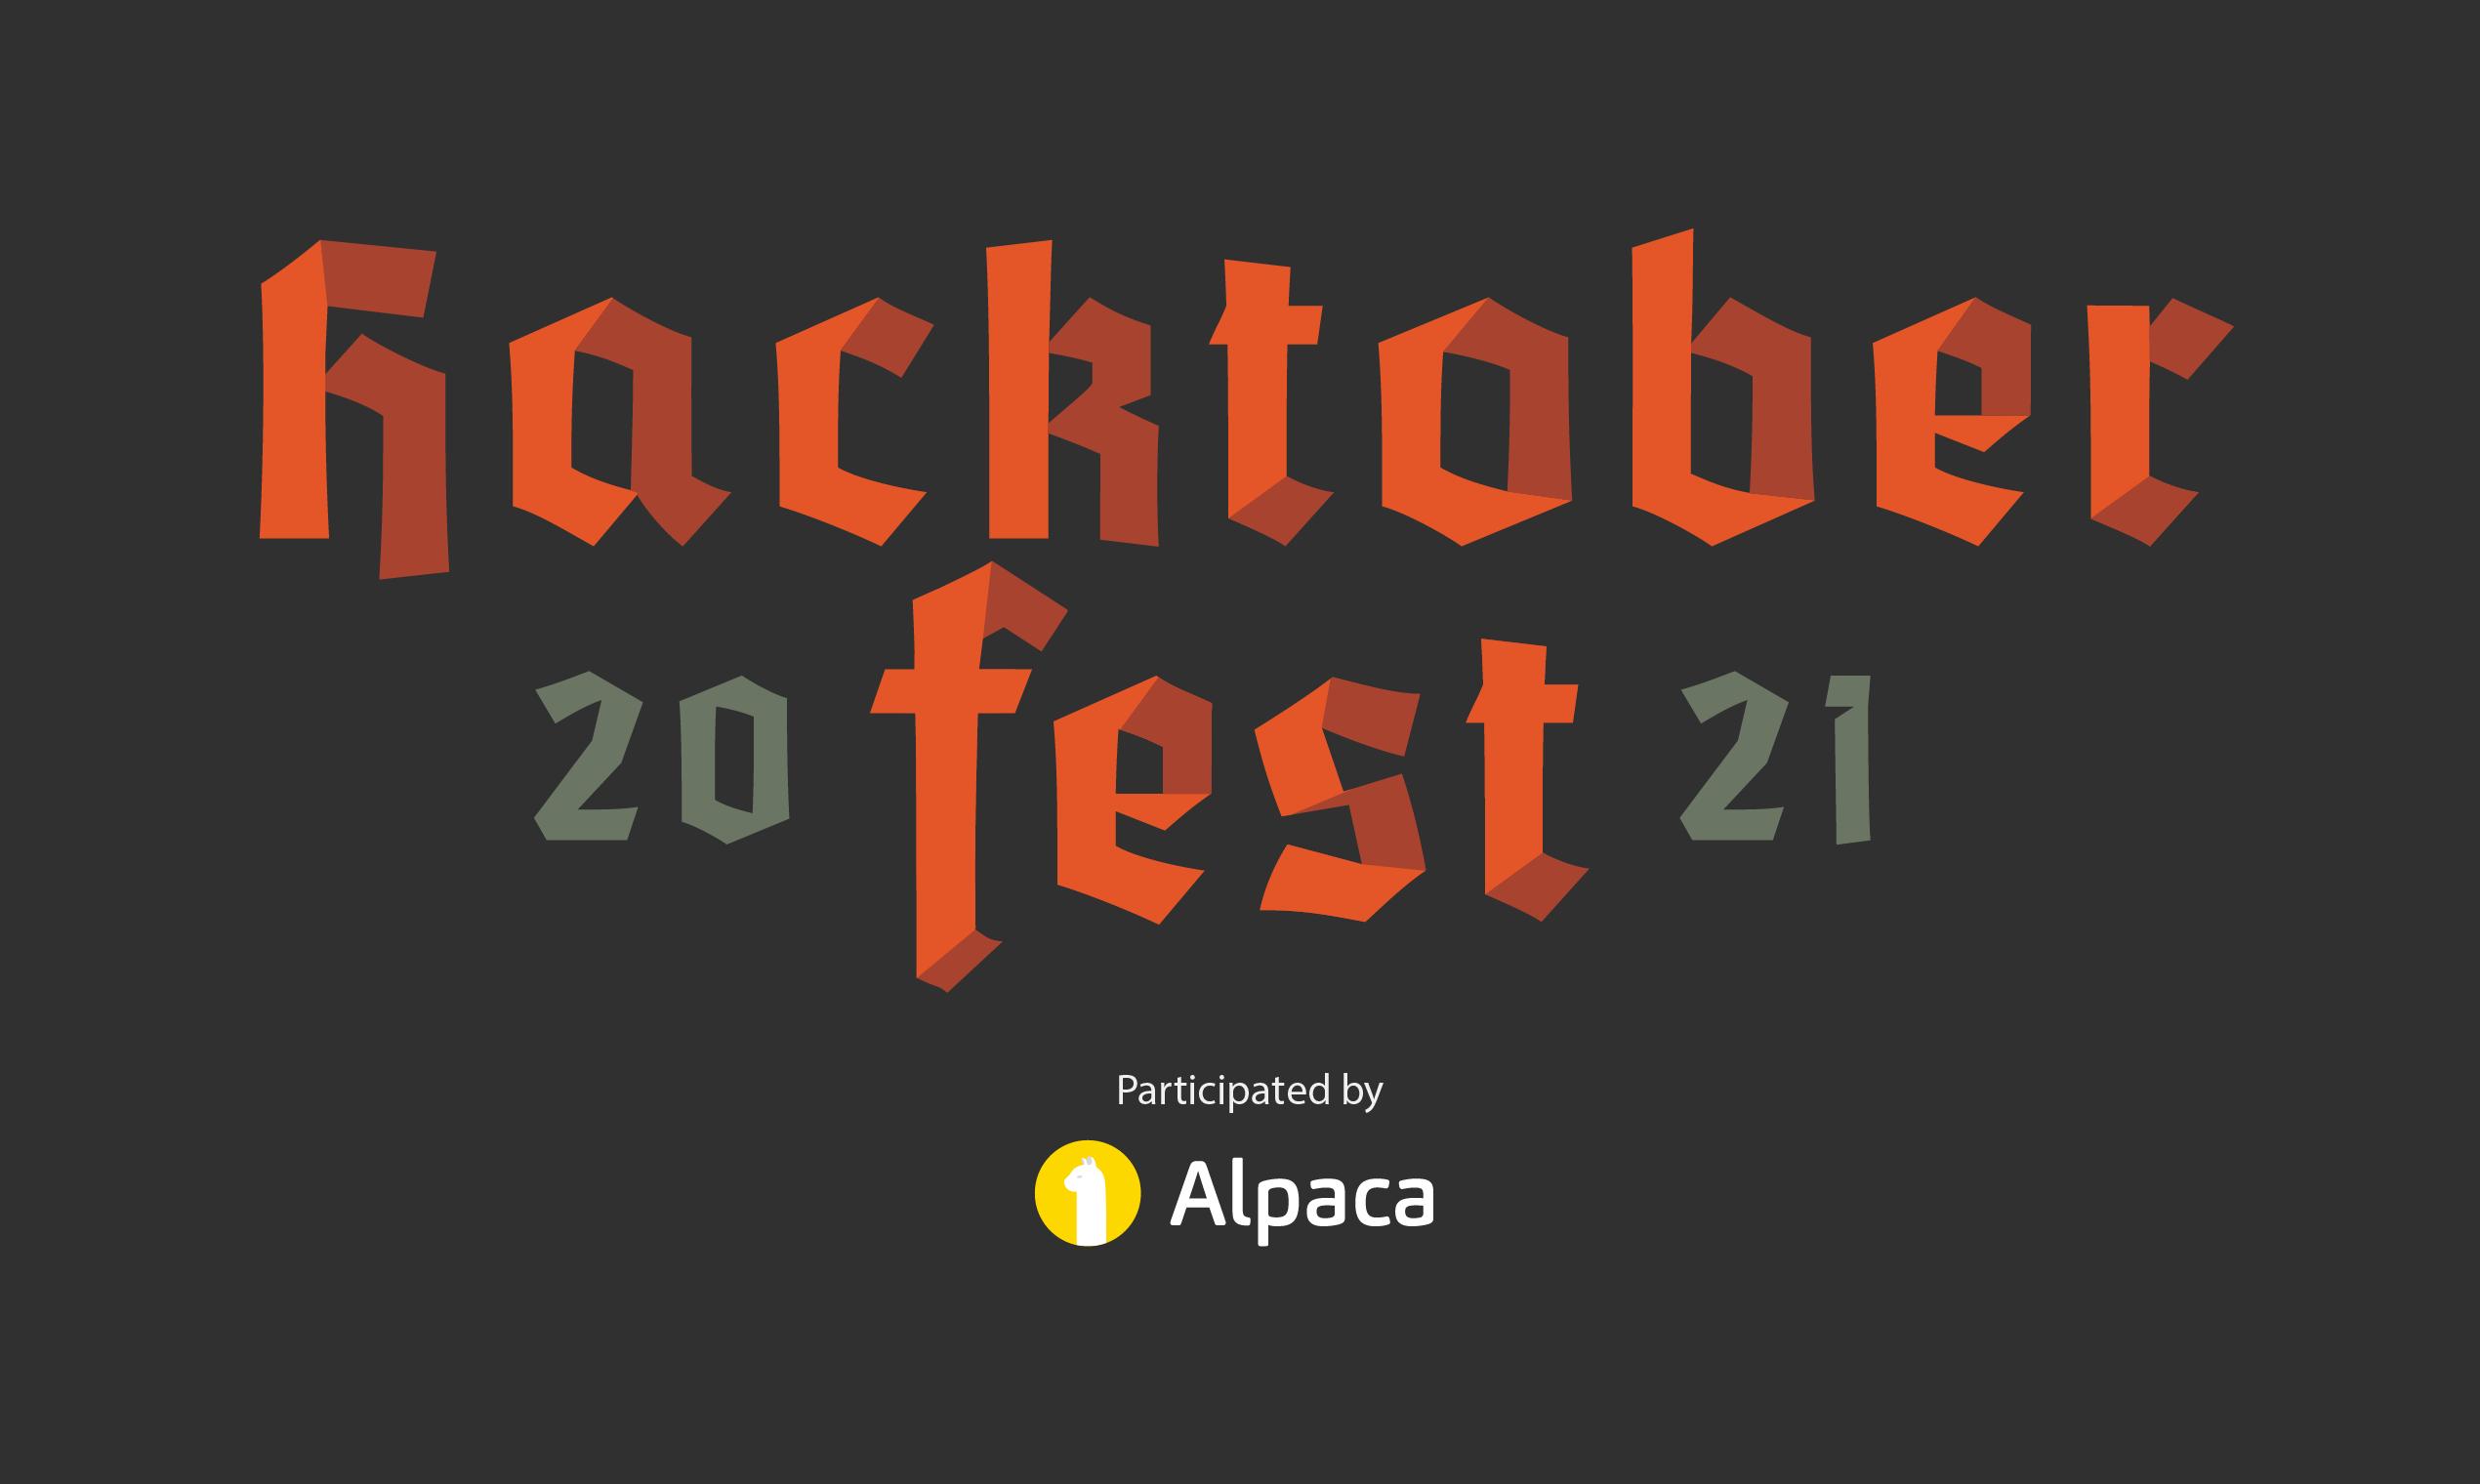 Hacktoberfest 2021 🎃 Celebrate Open Source with Alpaca